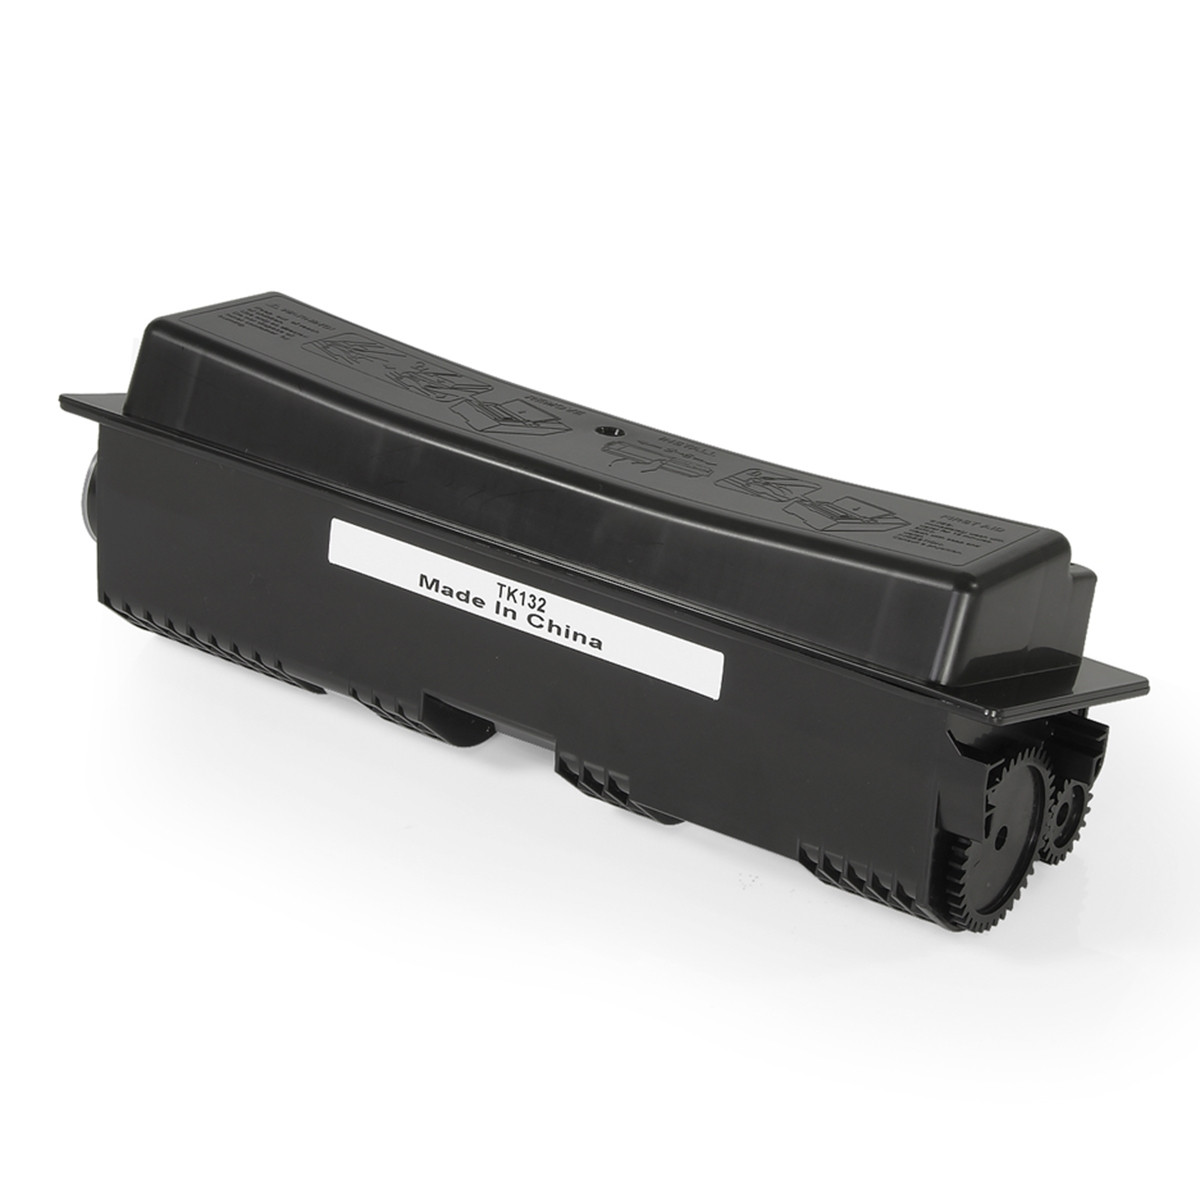 Toner Compatível Kyocera TK137 TK-137 | FS1100 FS-1100 | Importado 7k